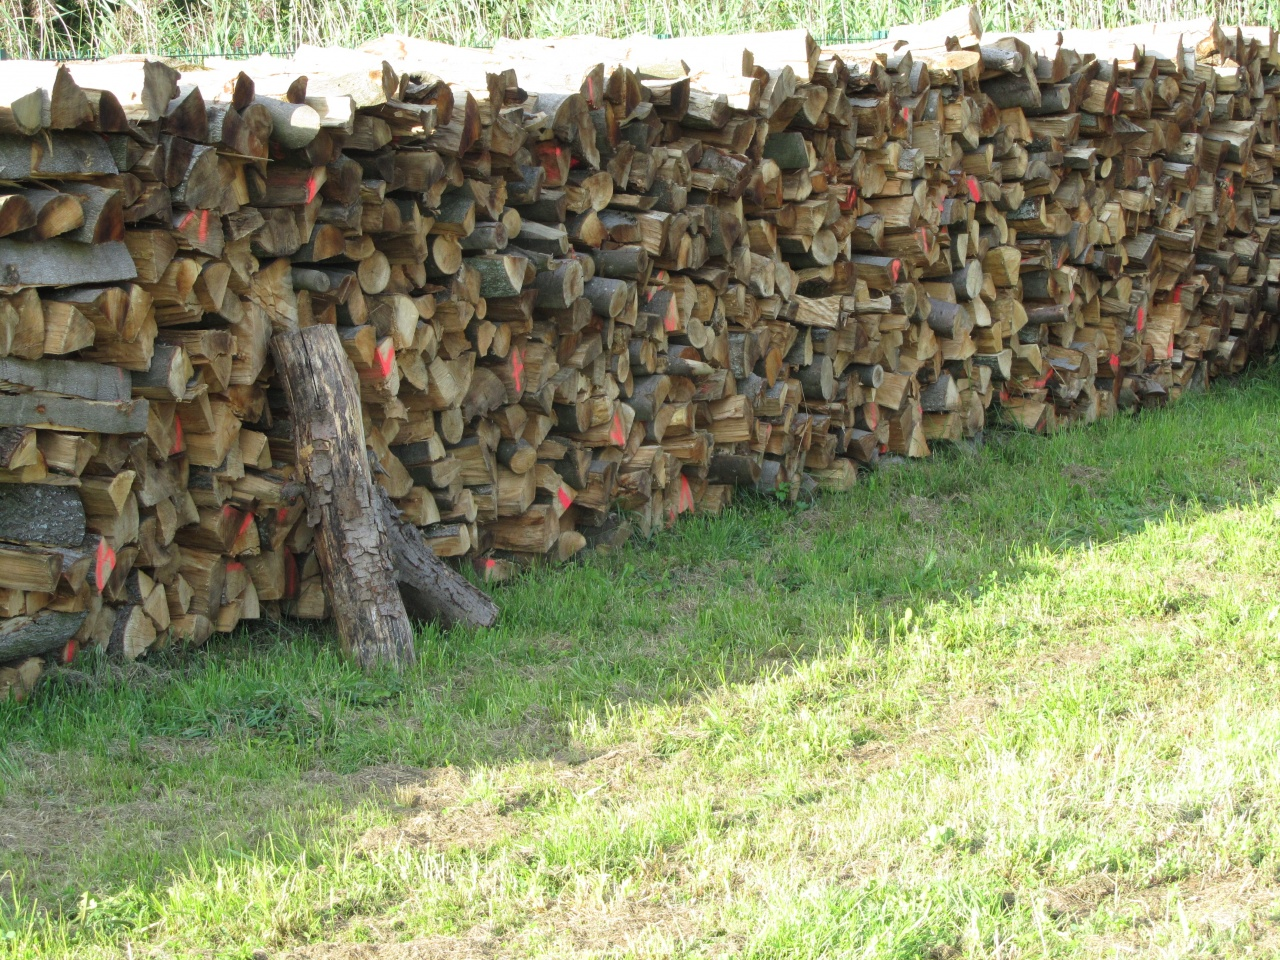 BOIS DE CHAUFFAGE # Negociant Bois De Chauffage